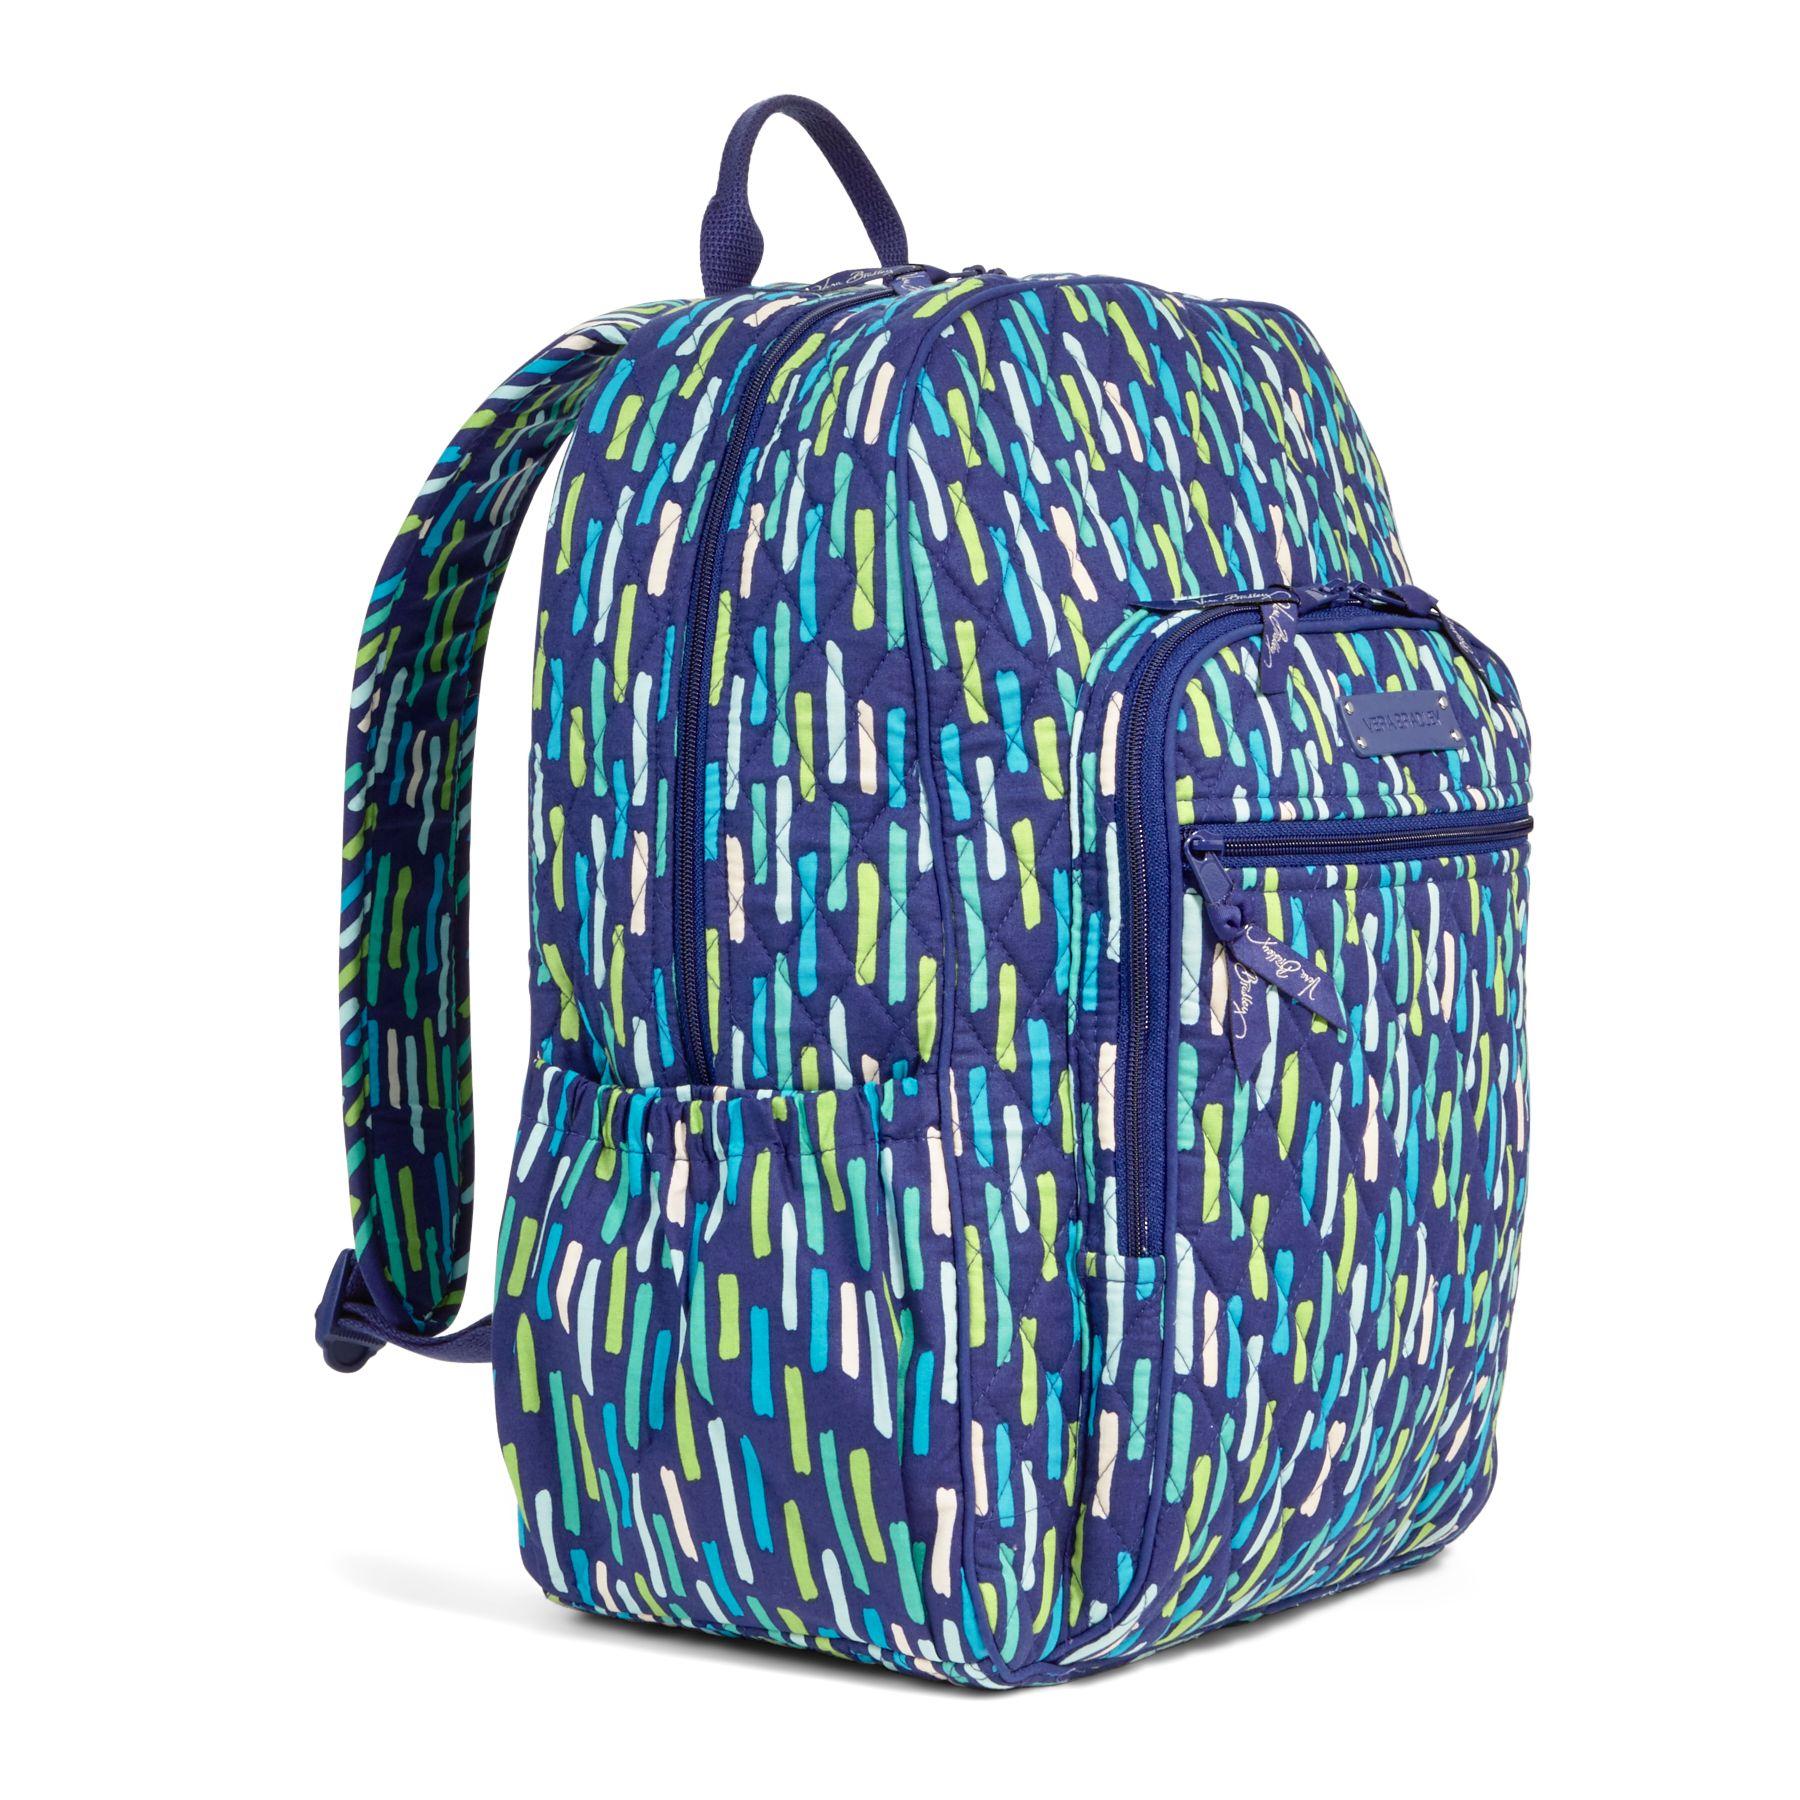 46c6f4c189 Best Price On Vera Bradley Campus Backpack